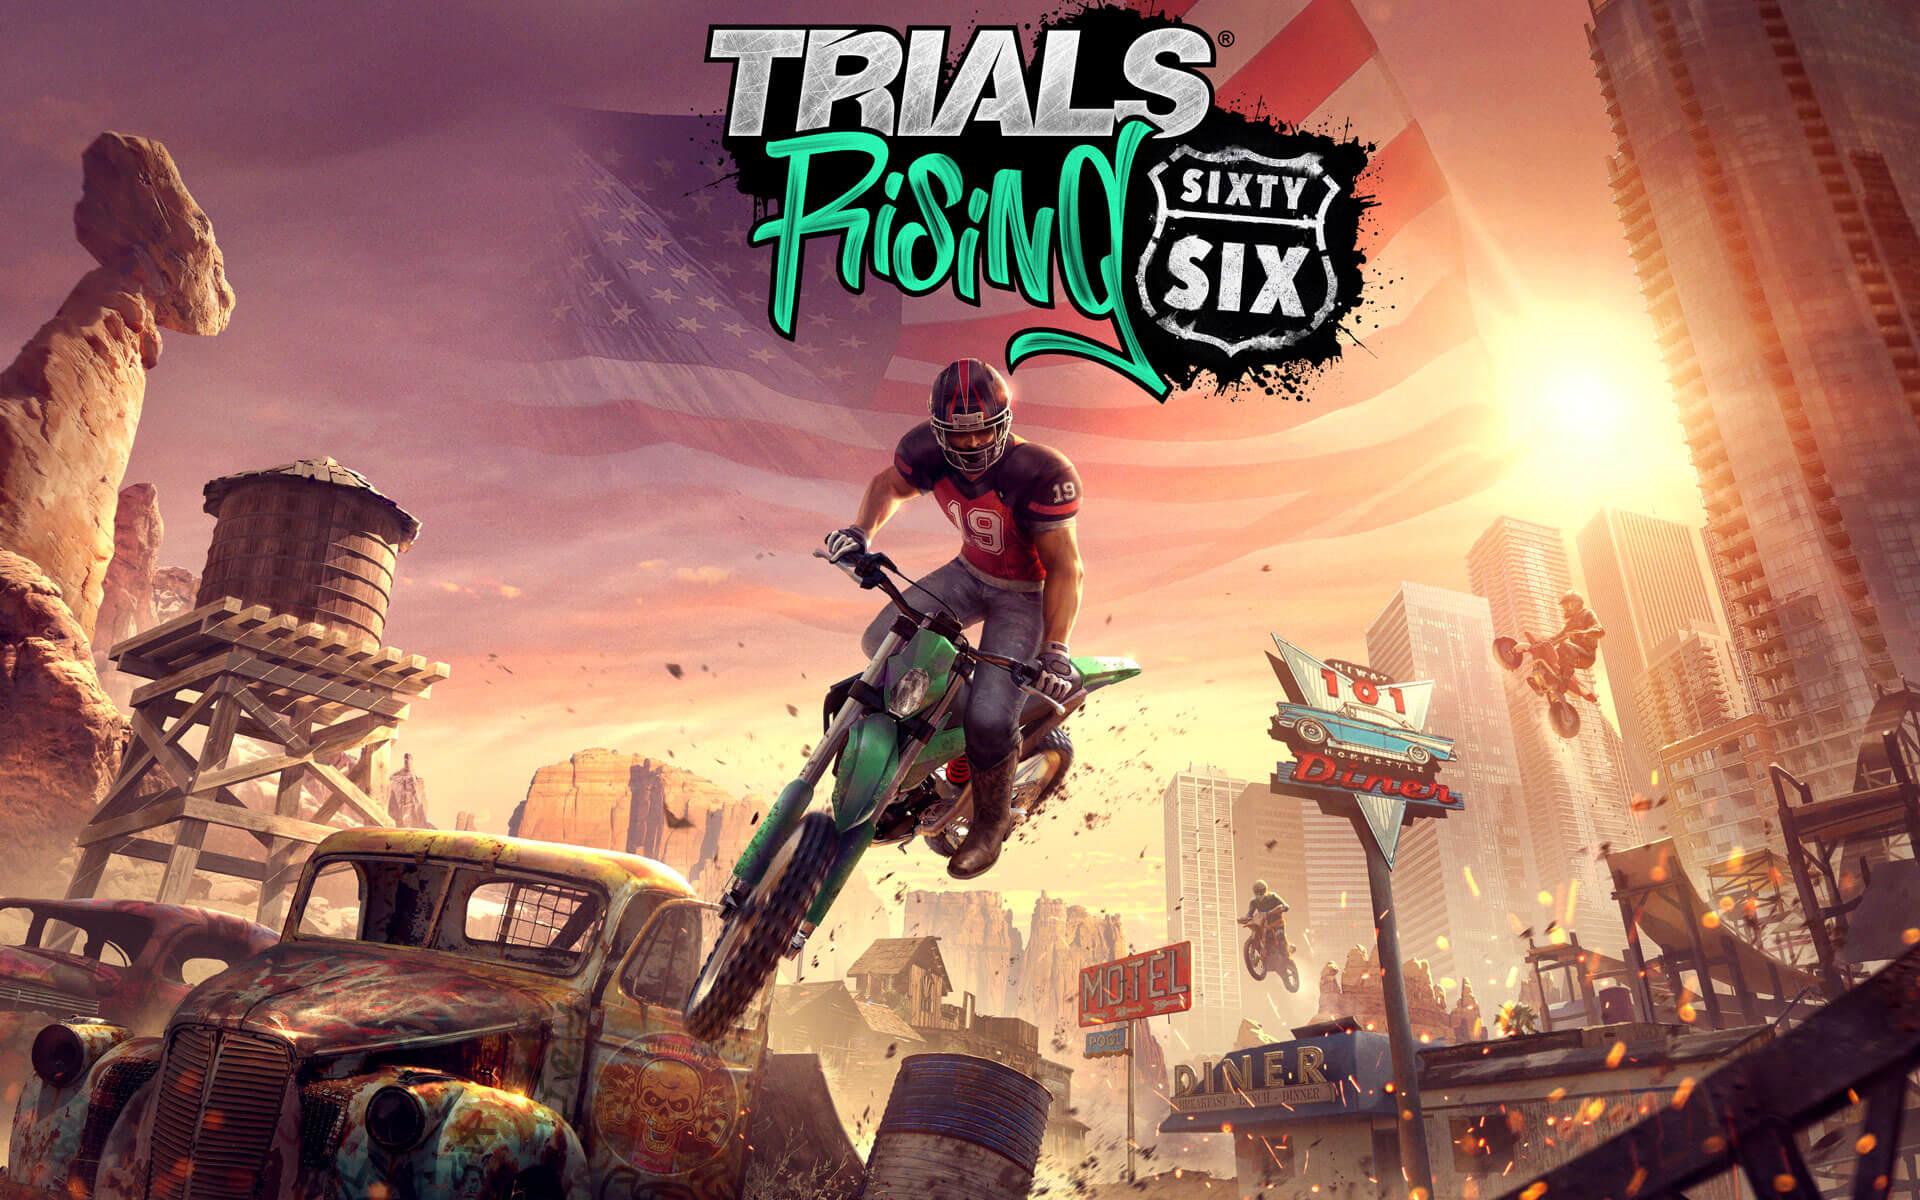 Trials Rising Sixty